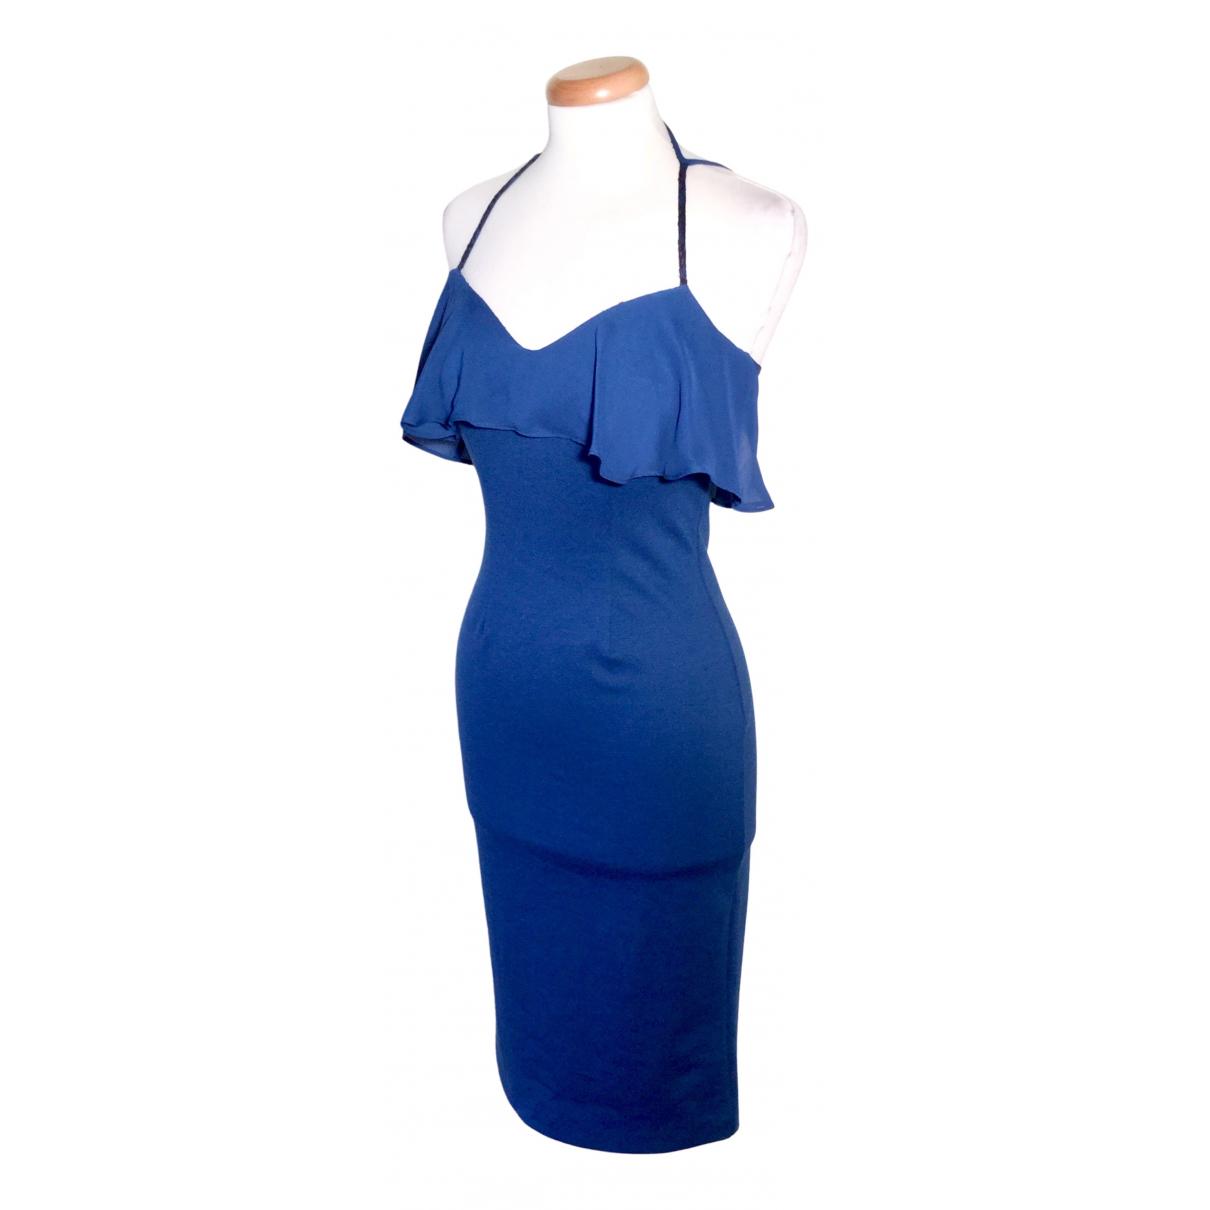 Dolce & Gabbana - Robe   pour femme - bleu